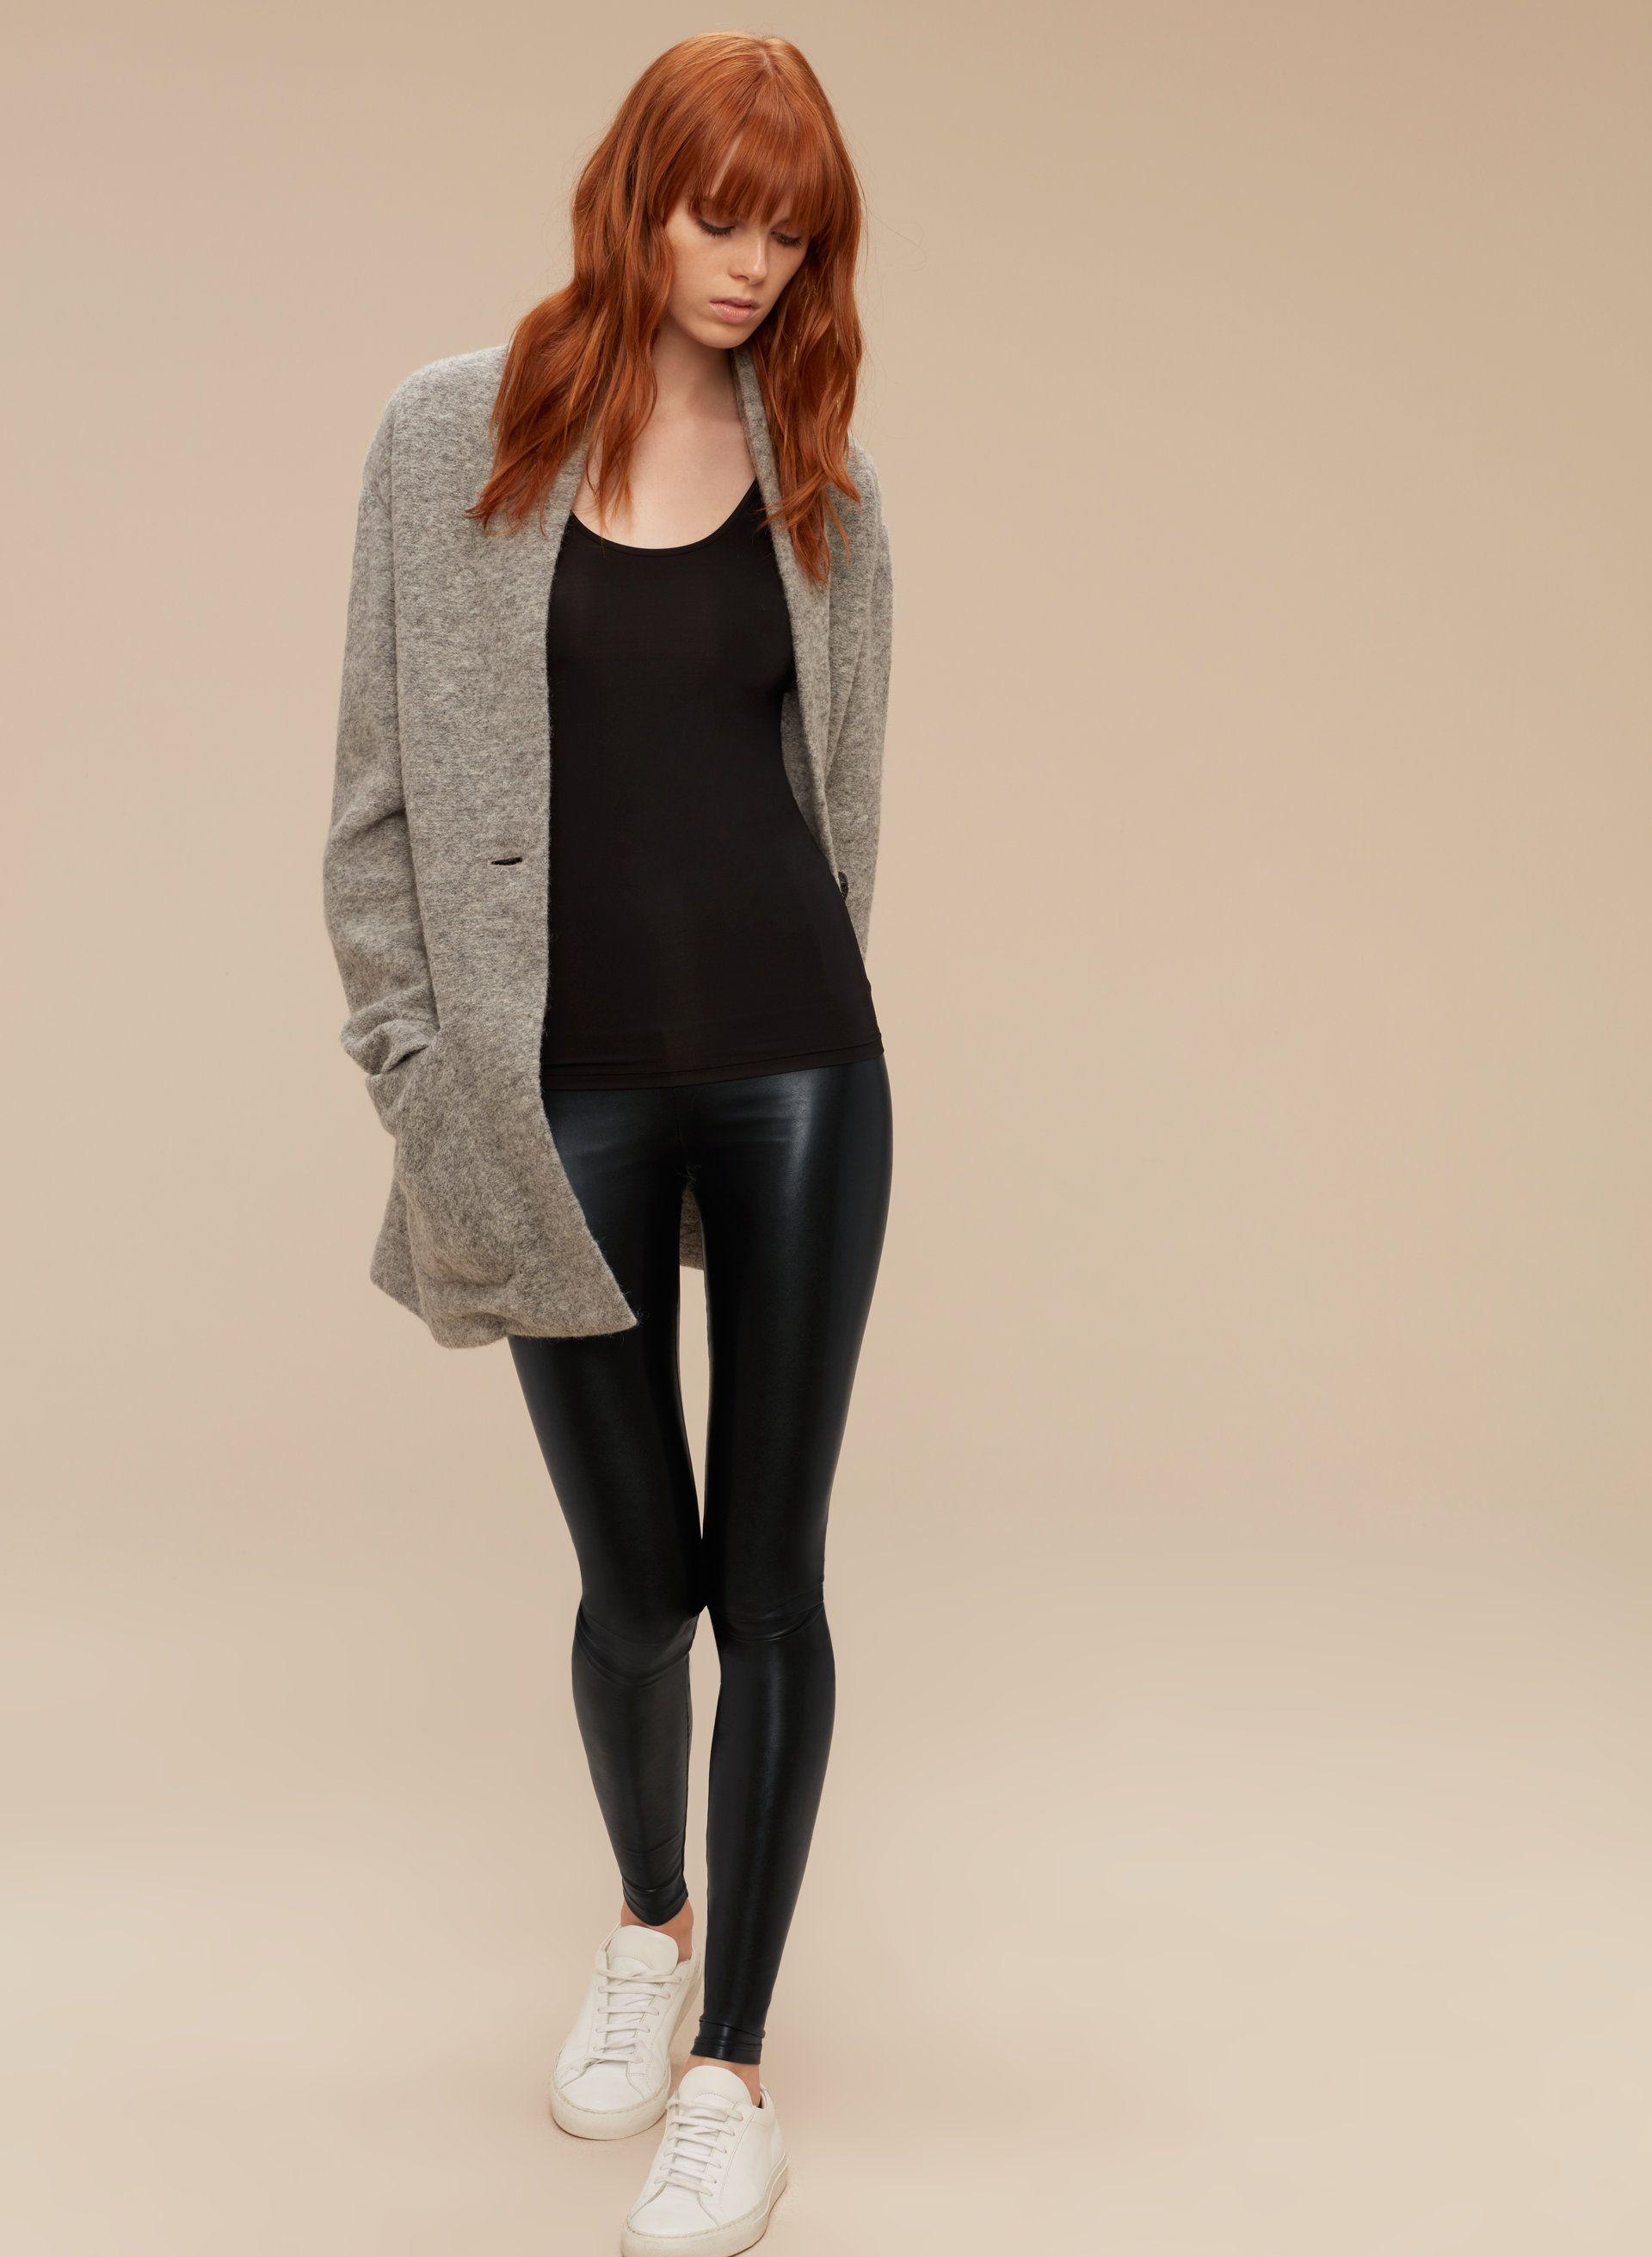 0b7f6e319fb30 Daria pant in 2019 | Fall/winter outfit ideas ♡ | Free leggings ...